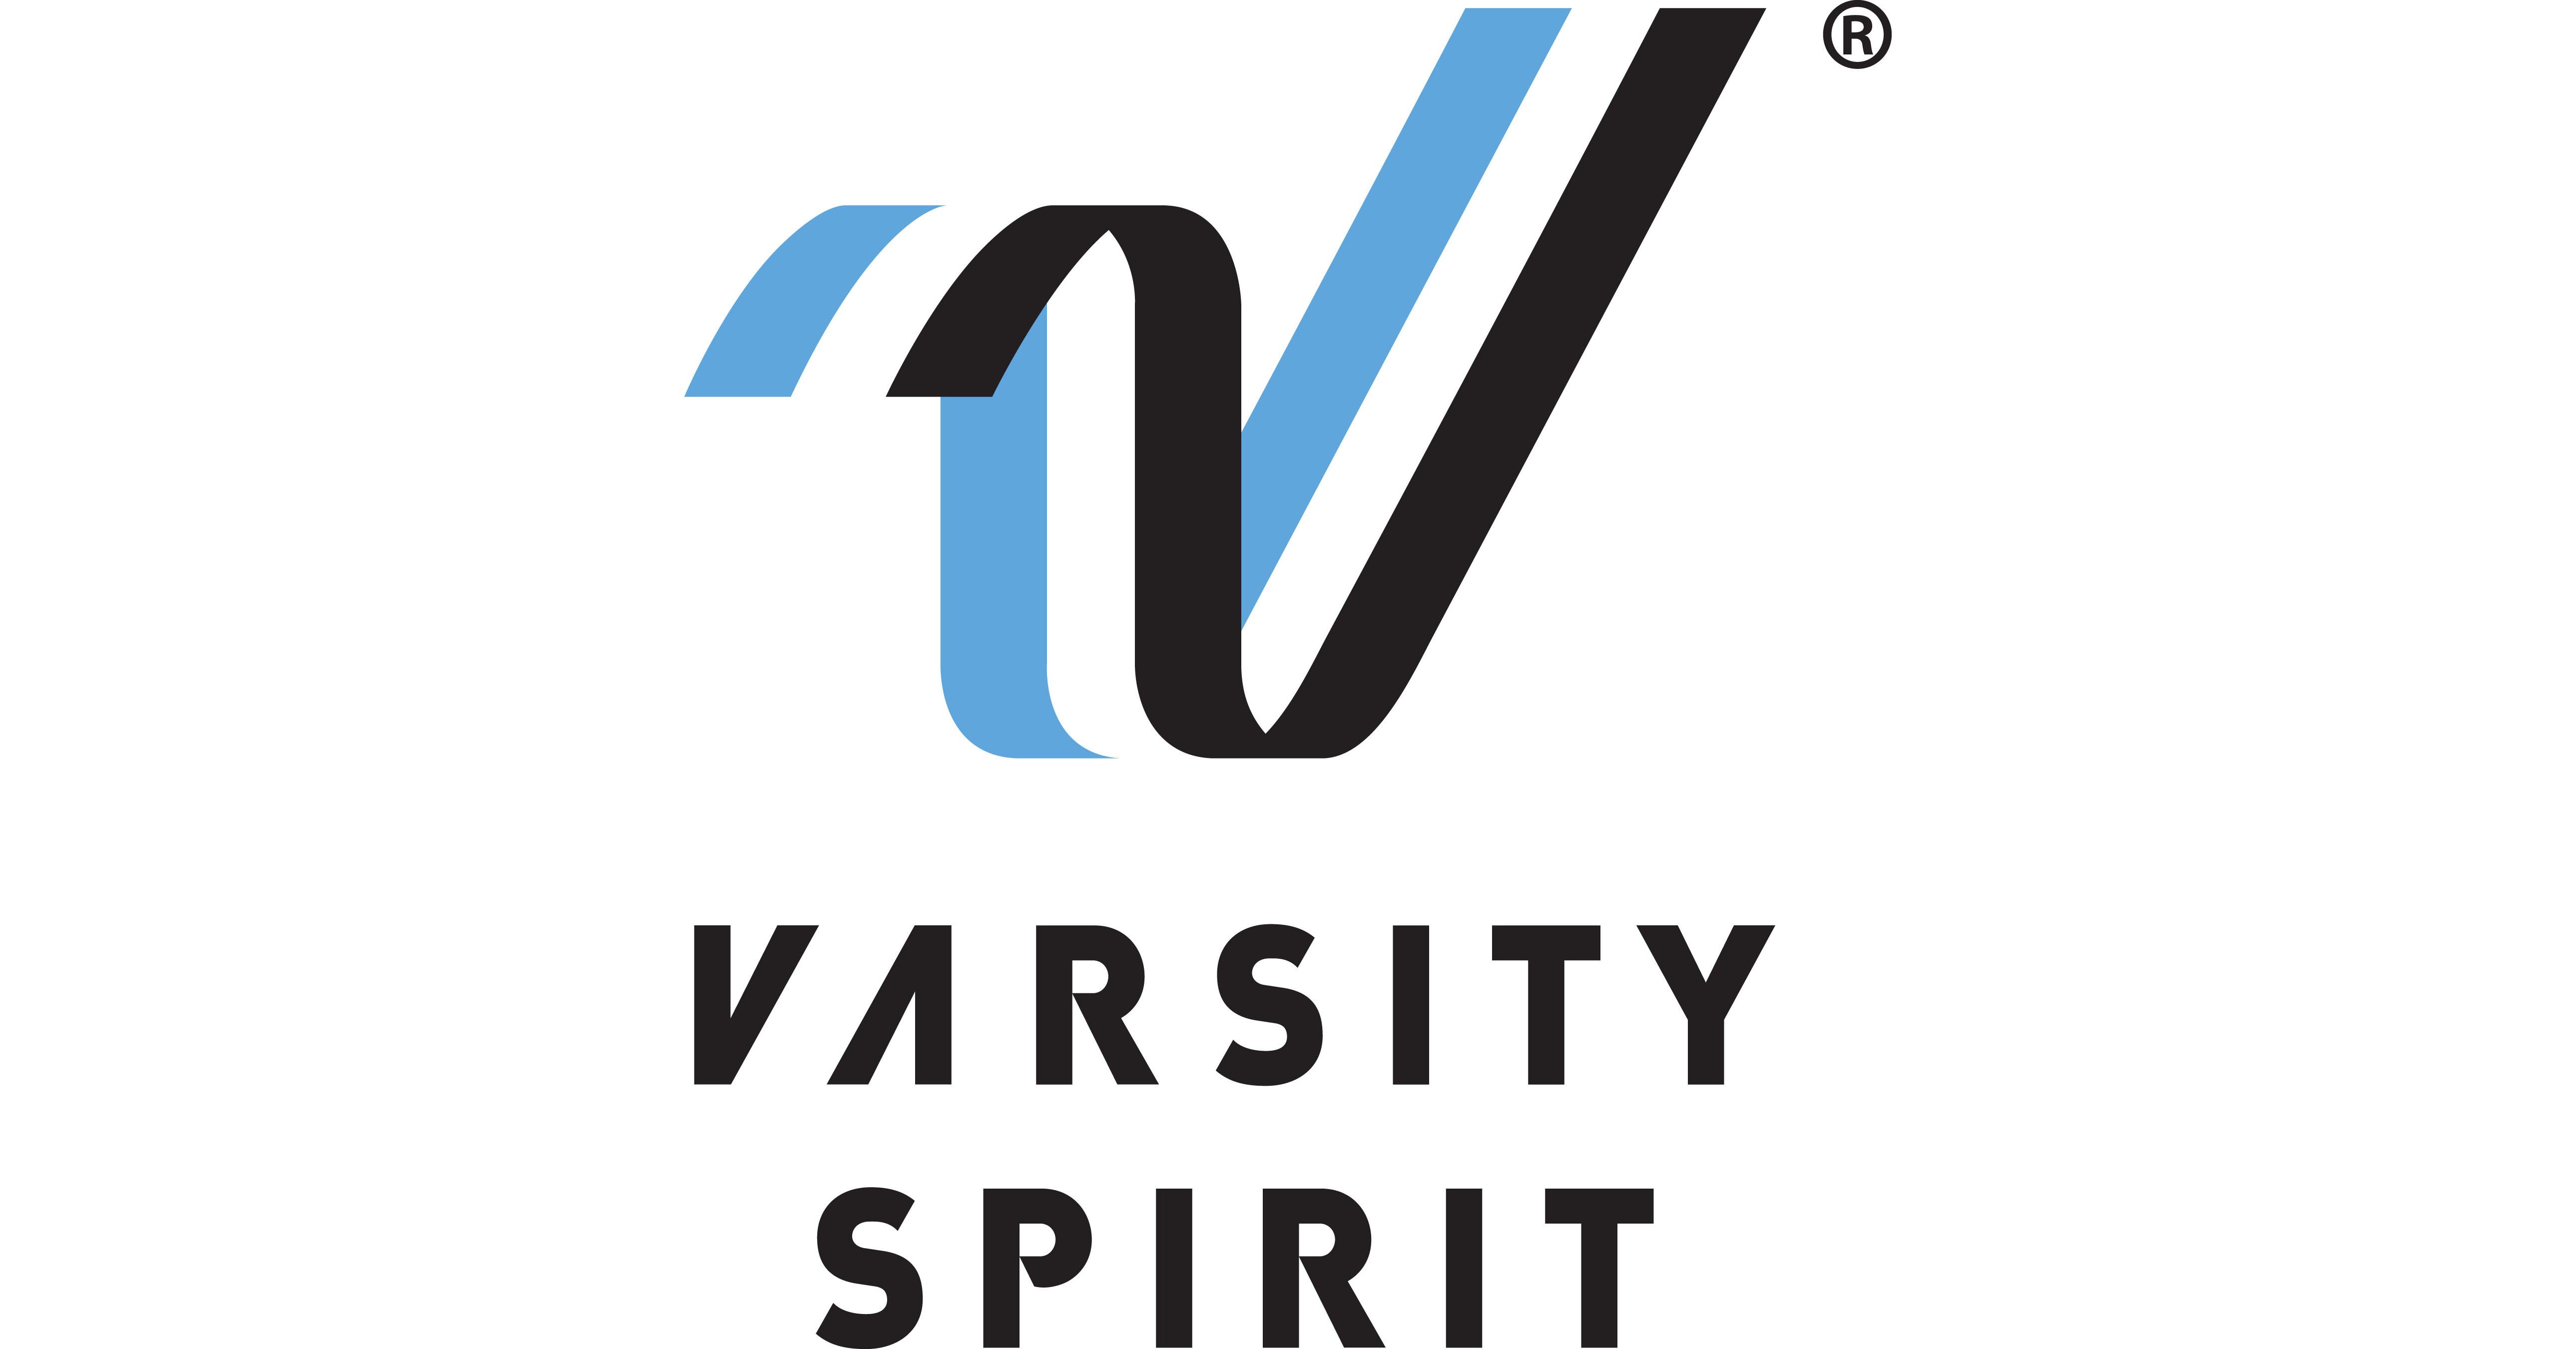 2019 National High School Cheerleading And Dance Team